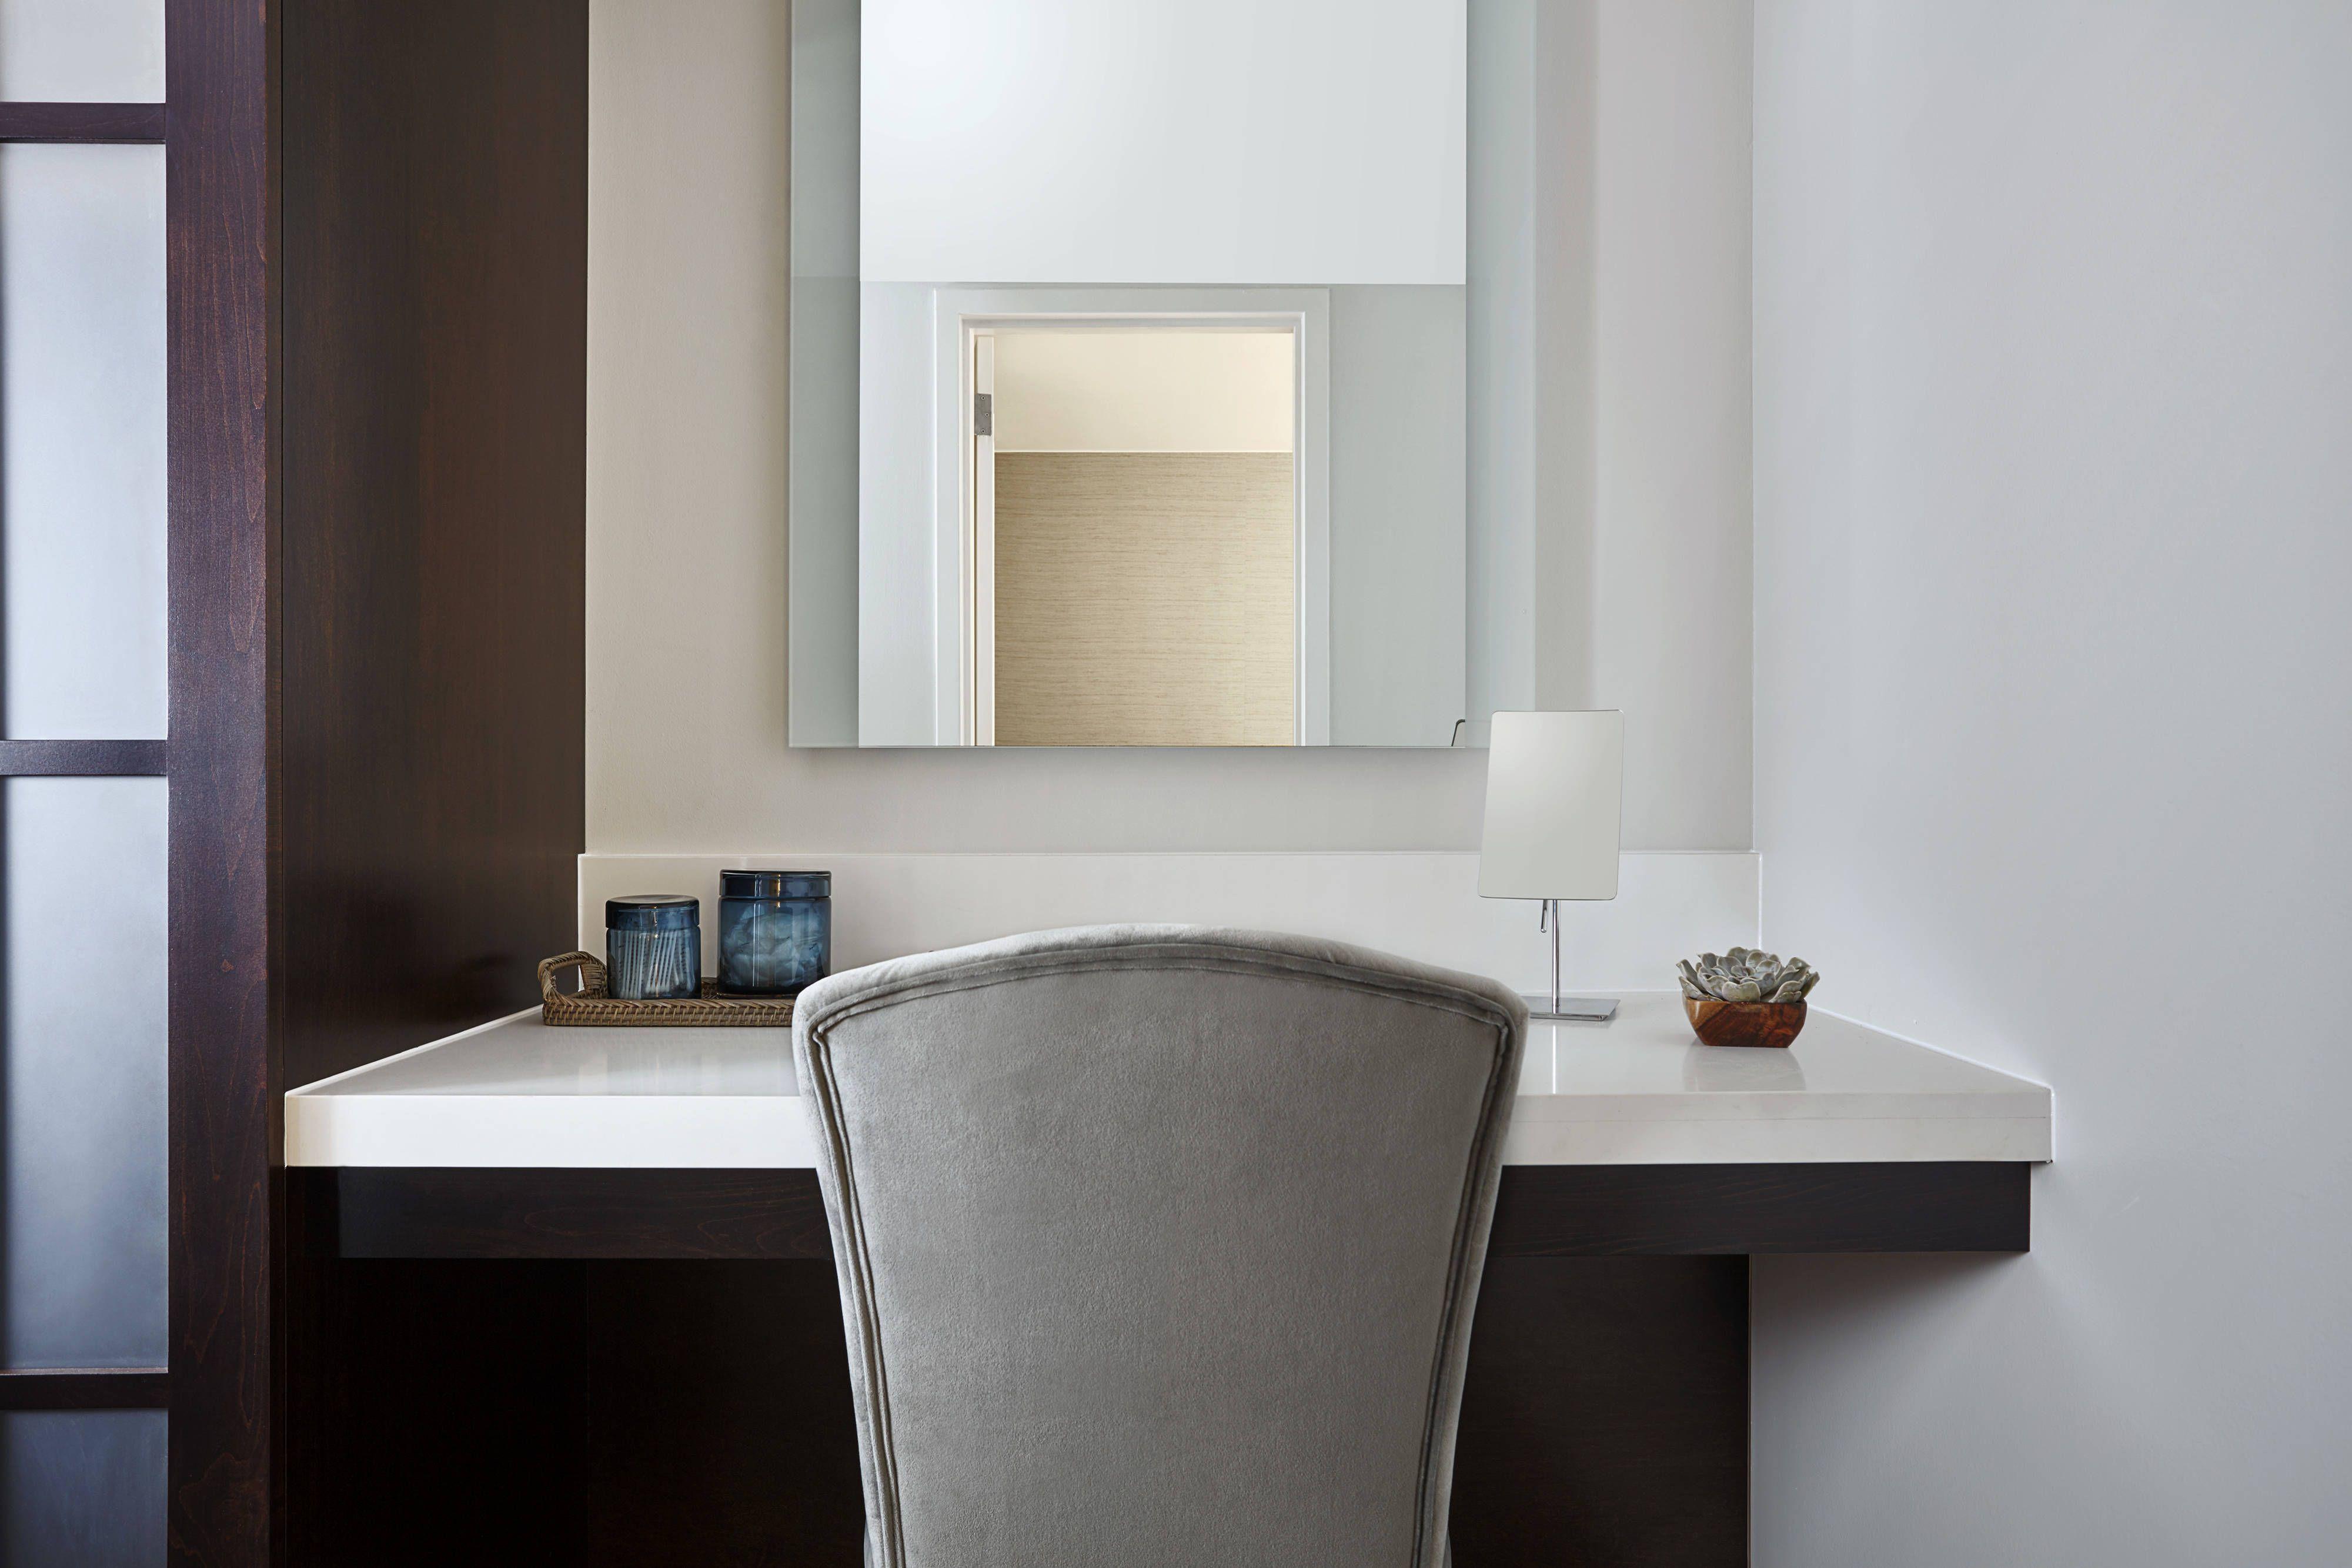 Charlotte marriott southpark onebedroom suite vanity